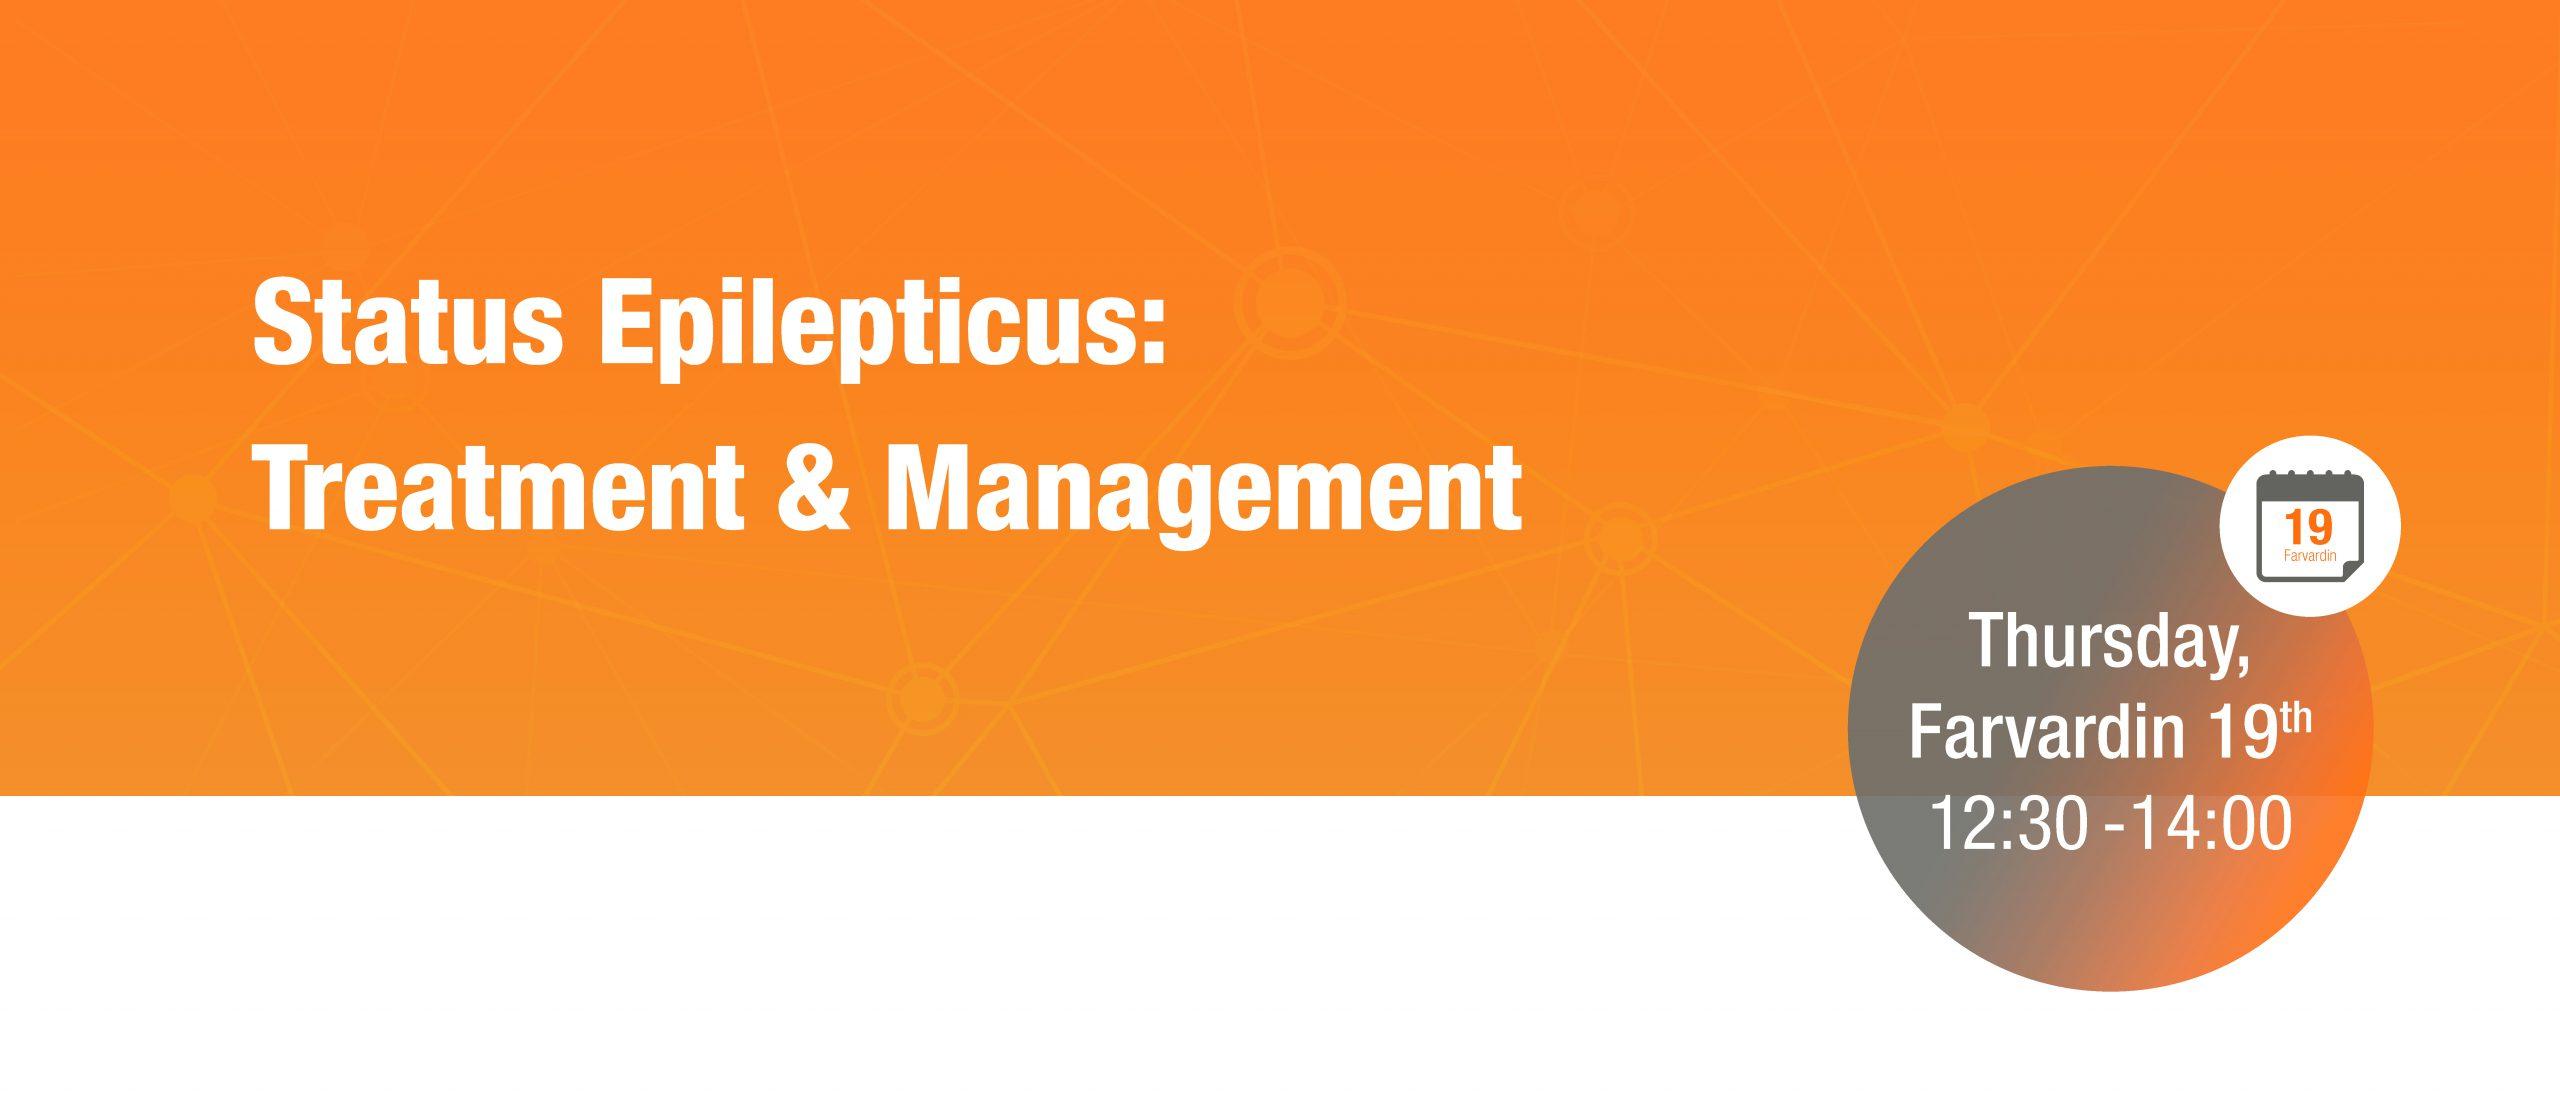 Status Epilepticus: Treatment and Management